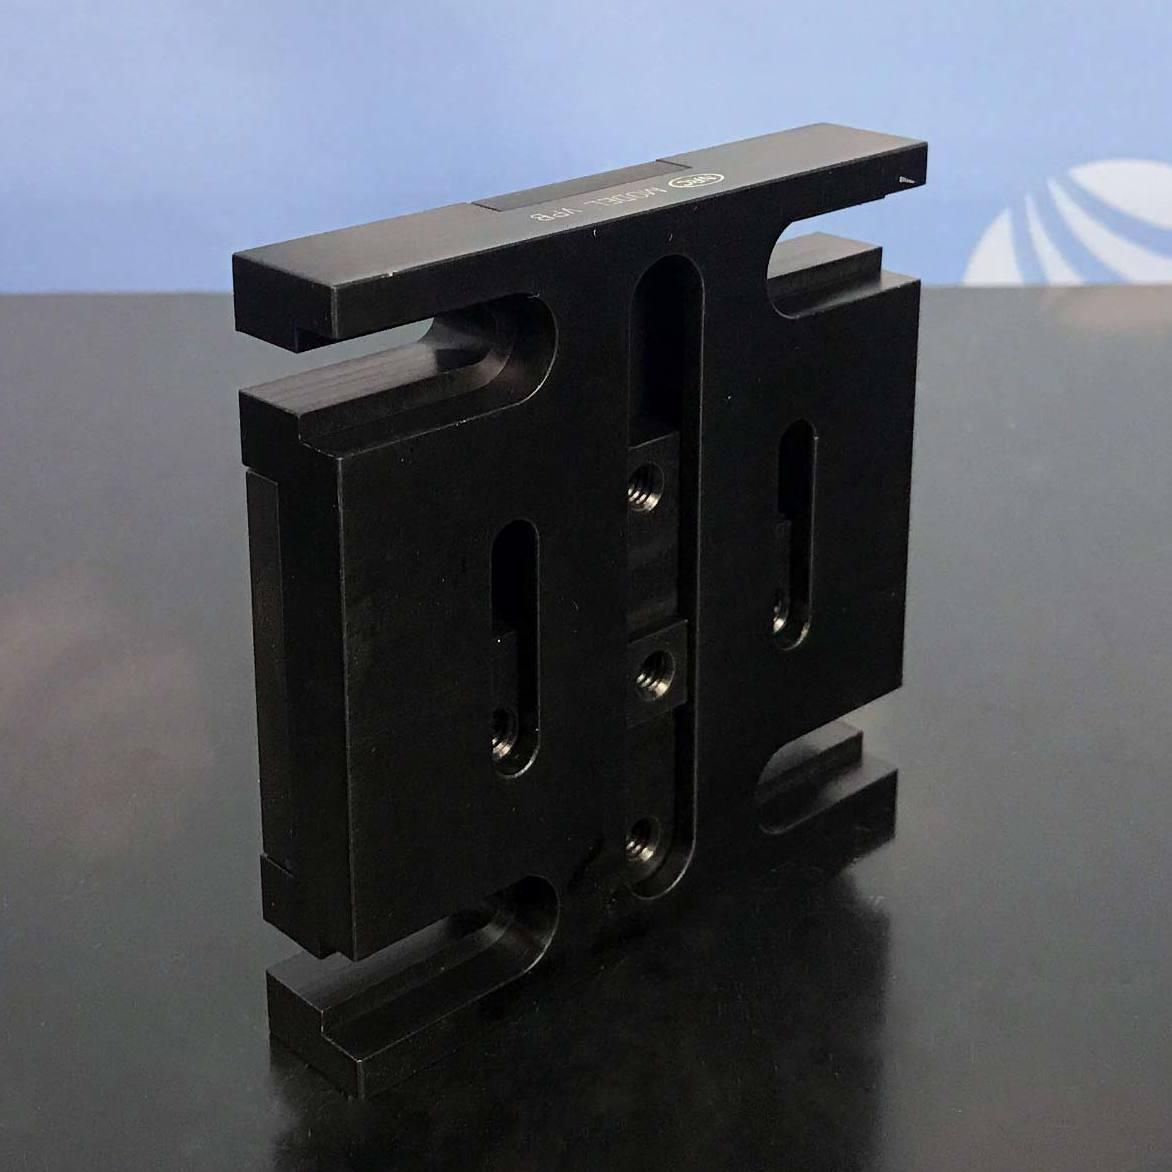 Newport Model VPB XY Adjustable Platform, 1/4-20 Thread  Image